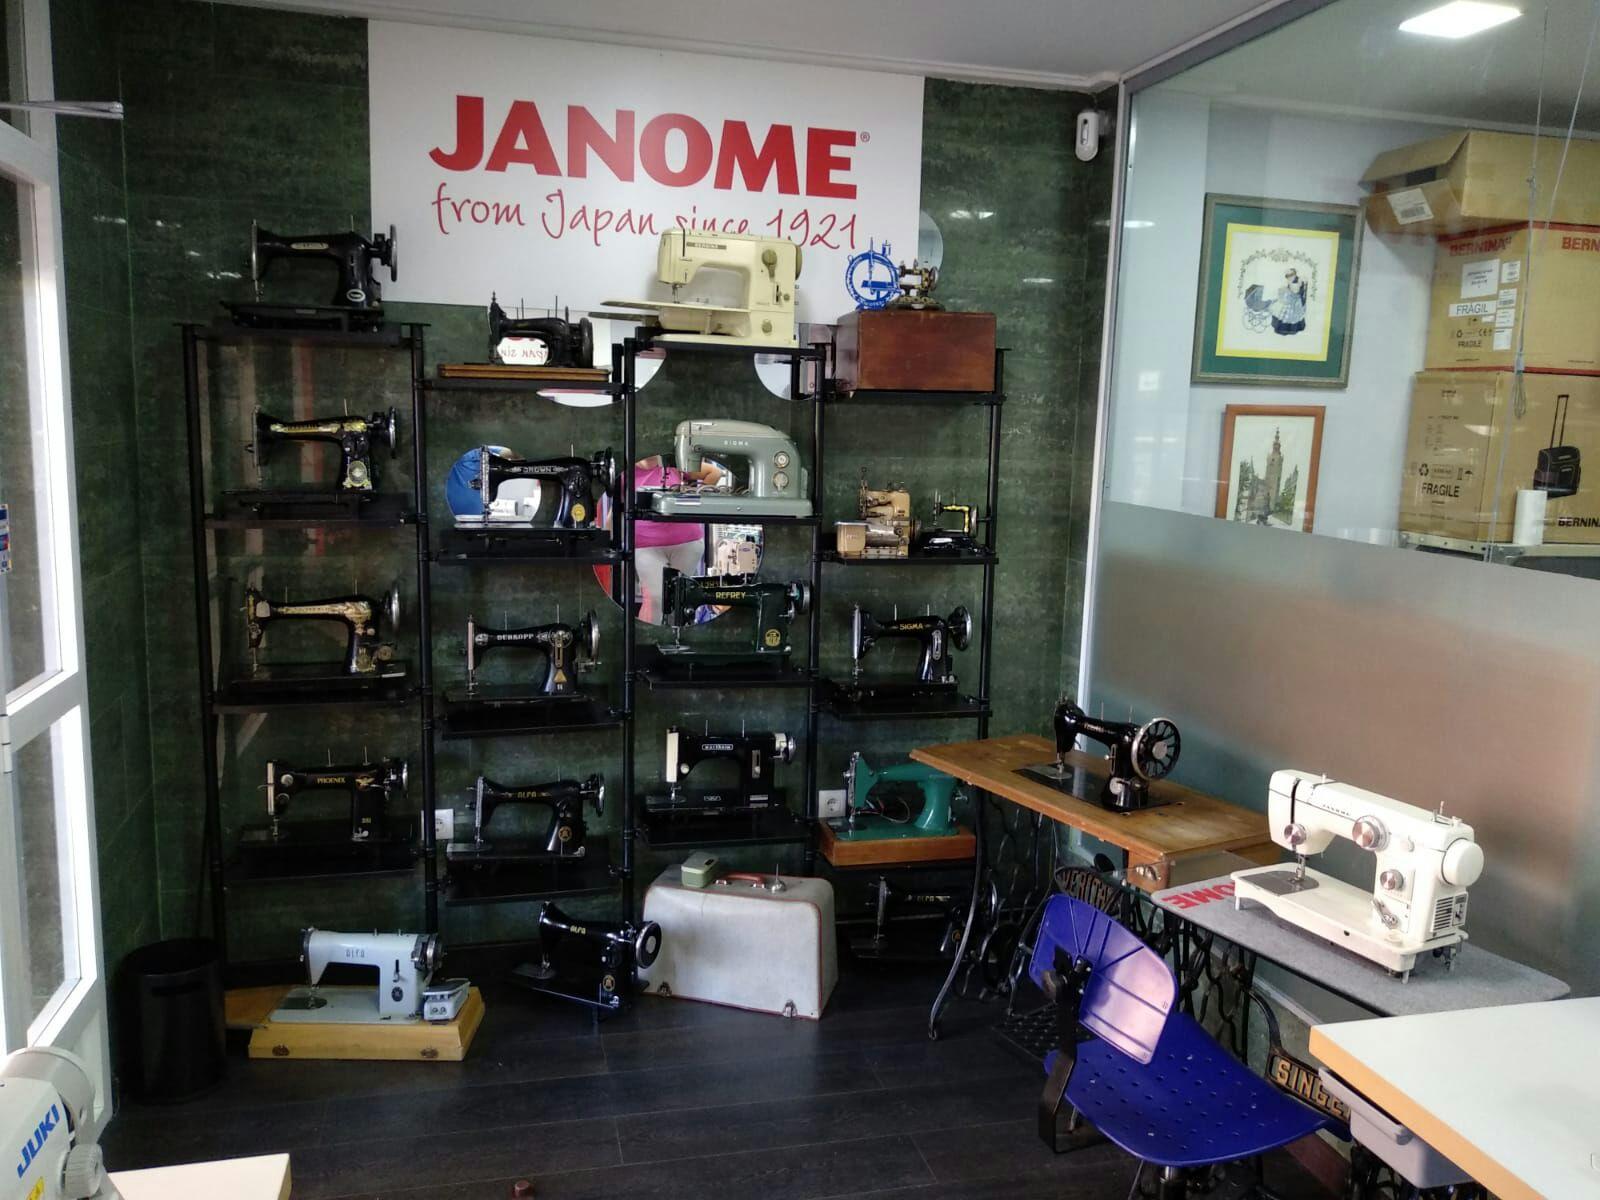 Macotex II: venta maquinas coser zona sur madrid, reparacion maquinas coser zona sur madrid